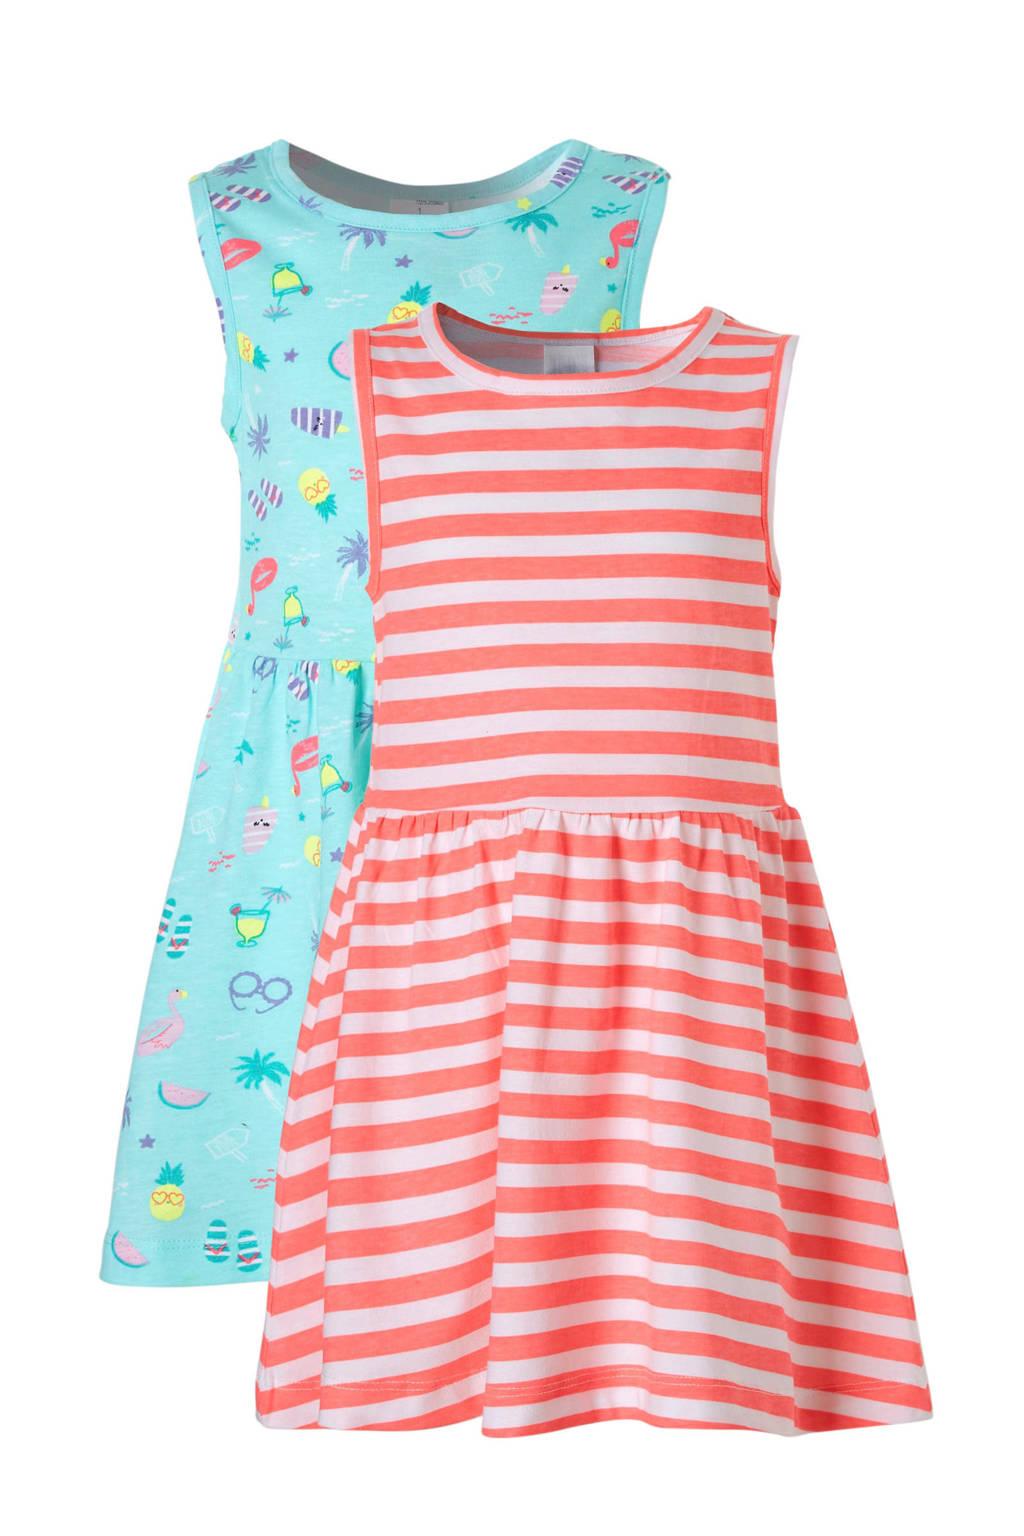 C&A Palomino jurk met alloverprint - set van 2 mintgroen/felroze, Mintgroen/felroze/wit